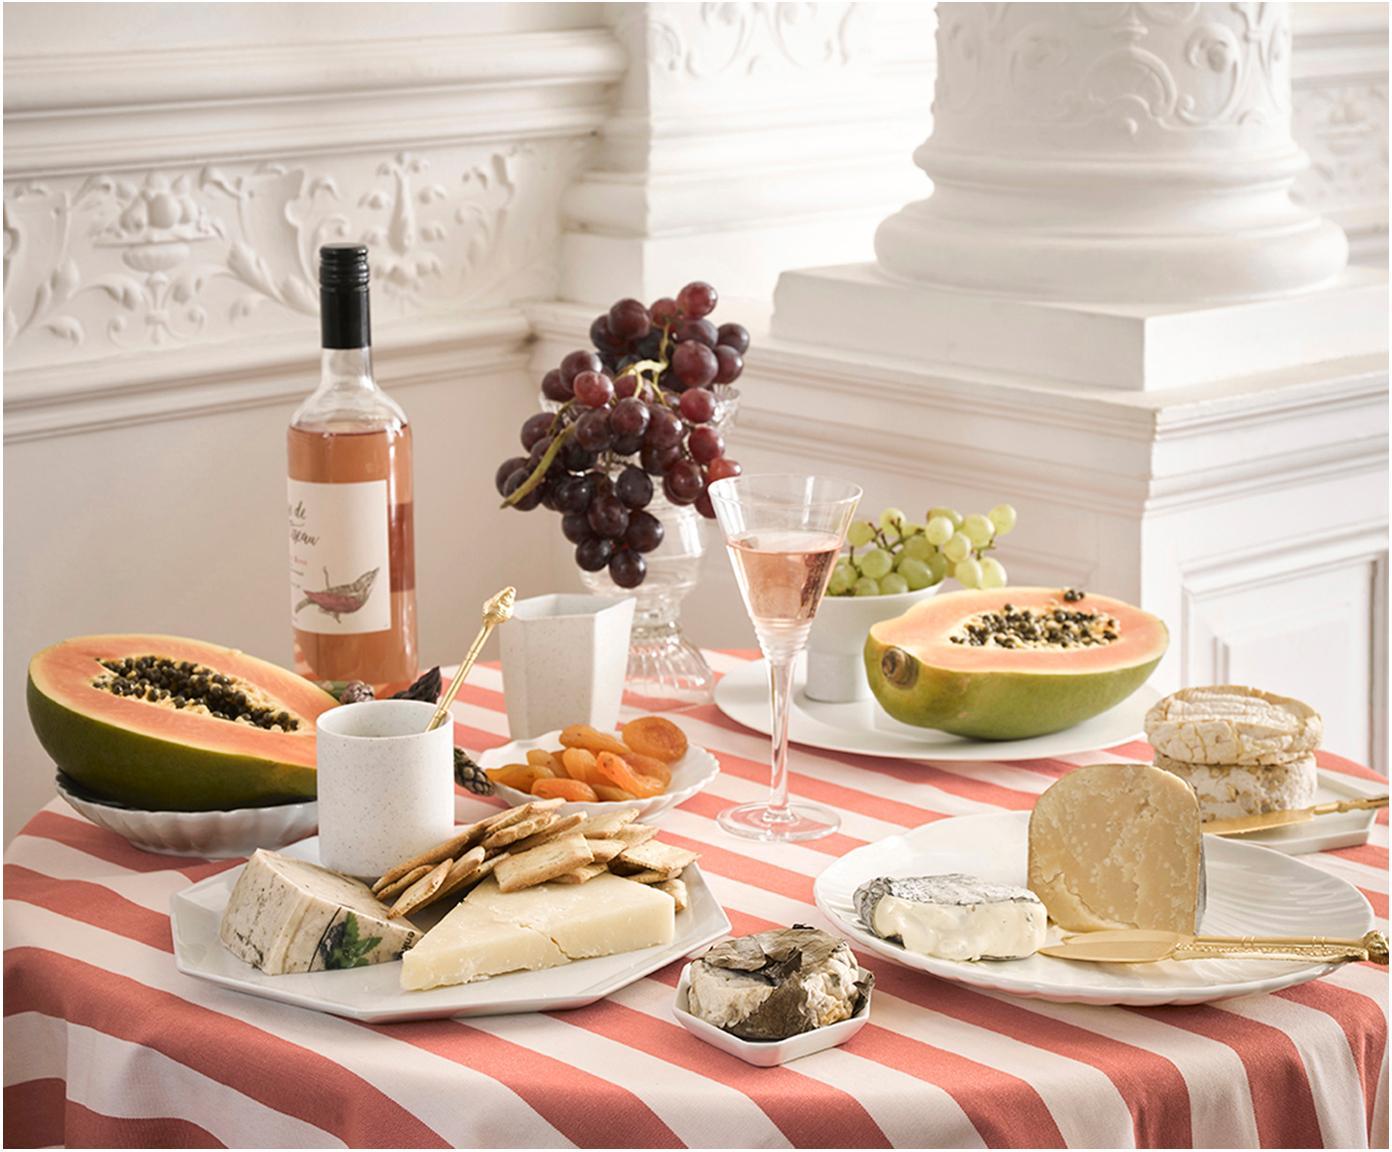 Goldfarbenes Käsemesser-Set Cheese aus Edelstahl, 3-teilig, Messer: Edelstahl, vermessingt, Dekor: Perlmutt, Messing, Sondergrößen